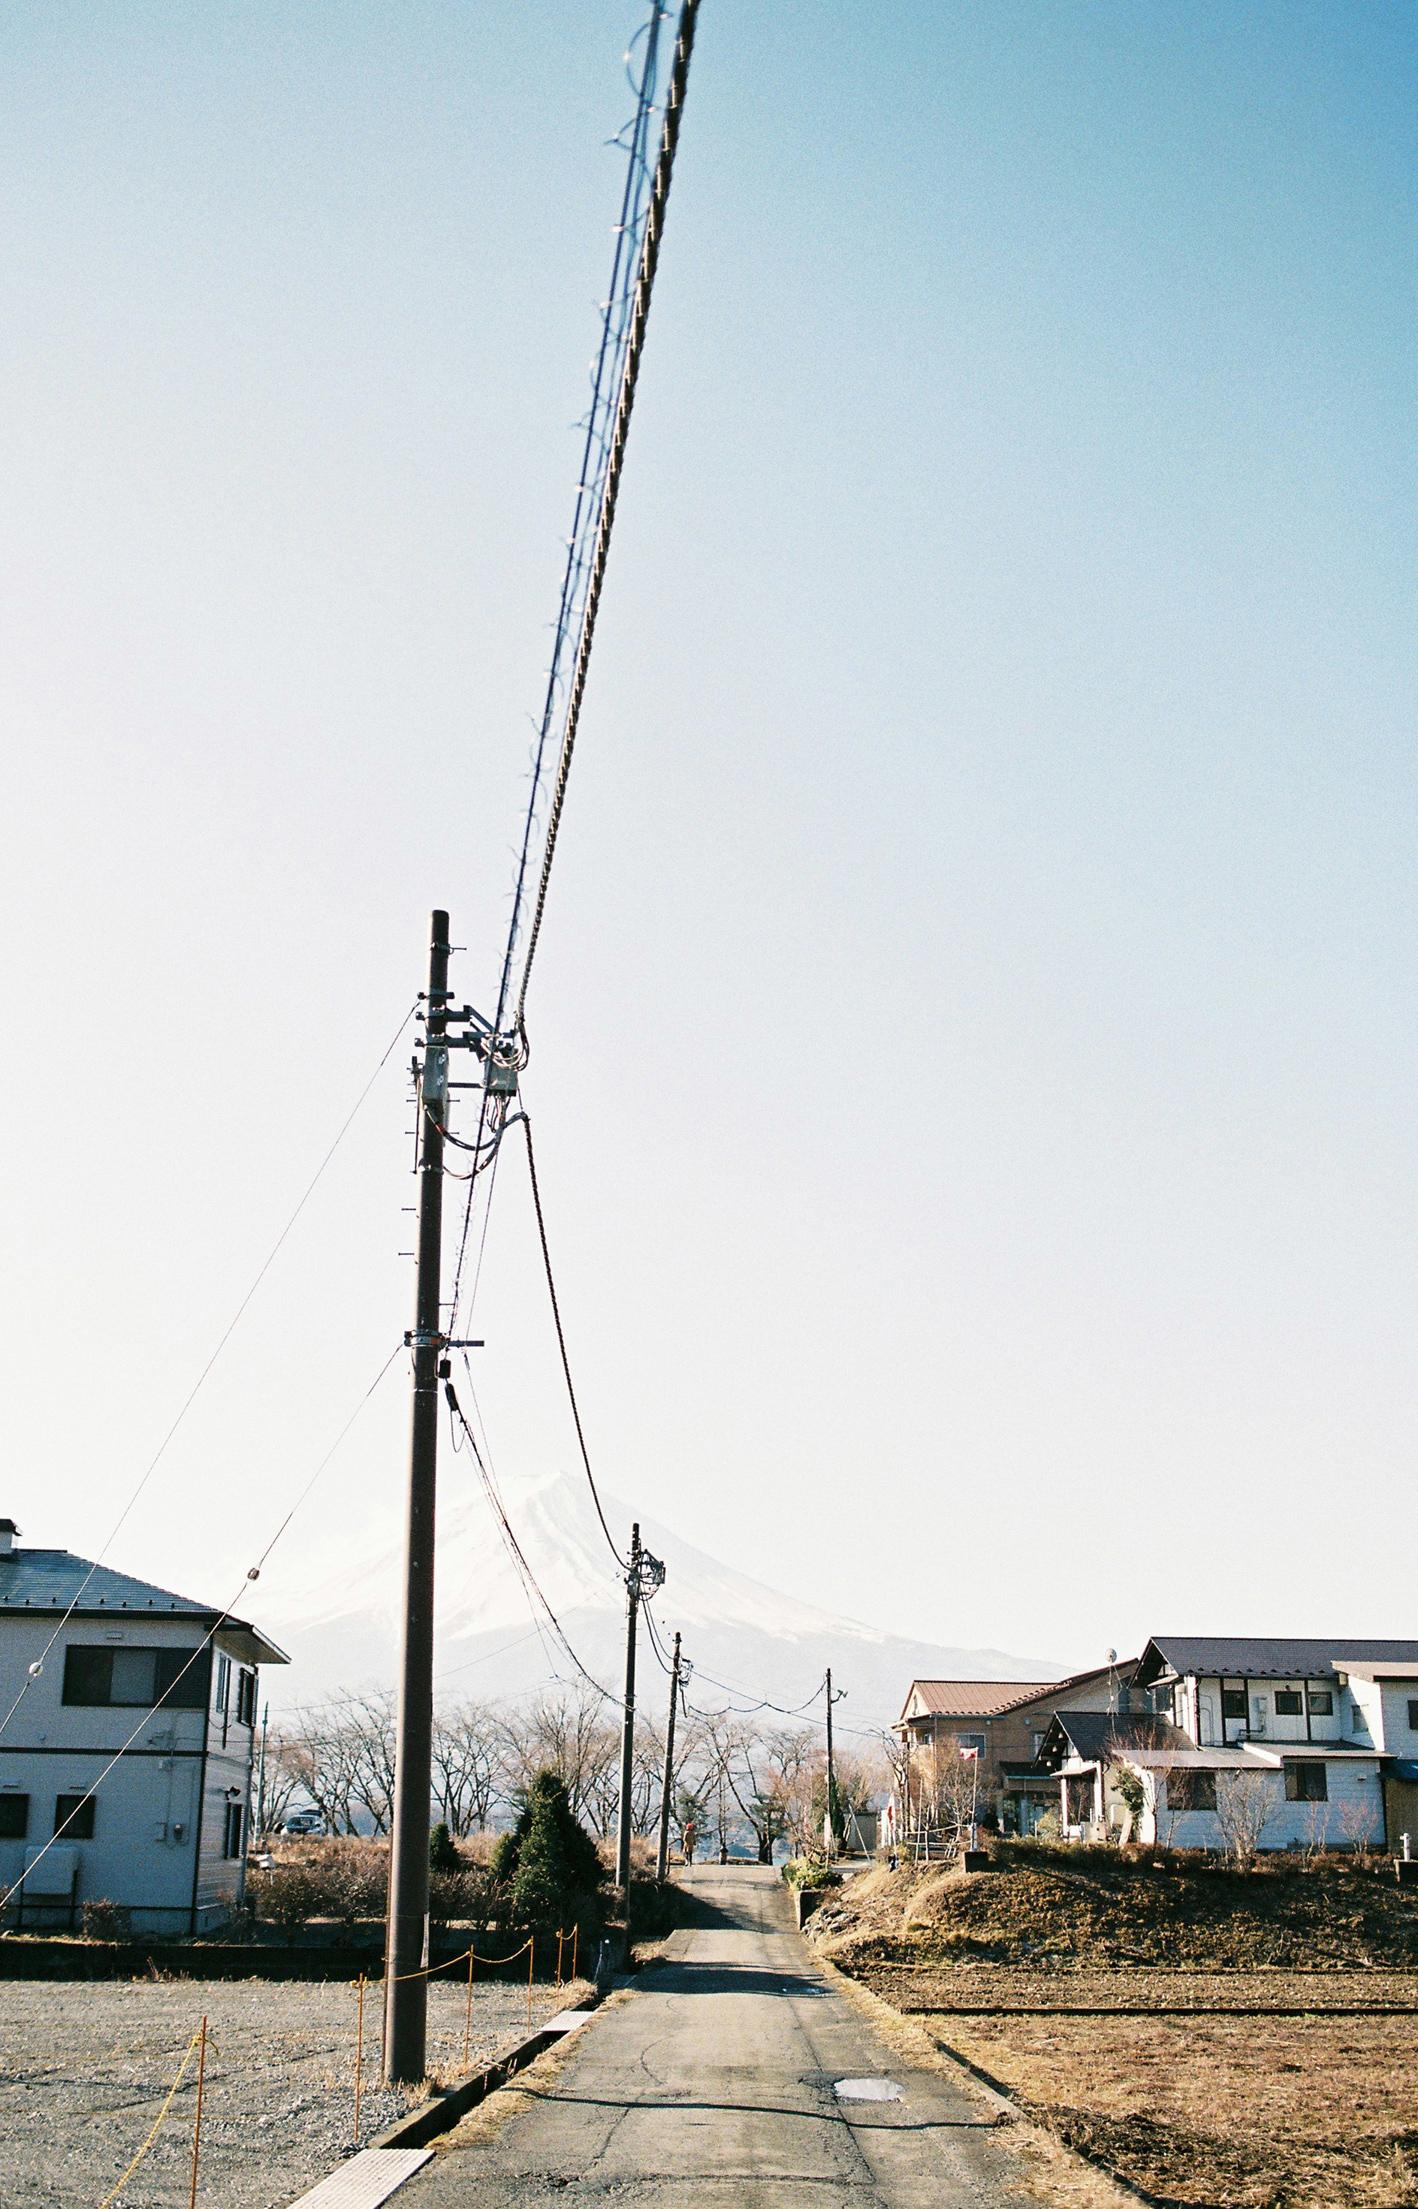 024-kawaguchiko-mount-fuji-japan-sophie-baker-photography